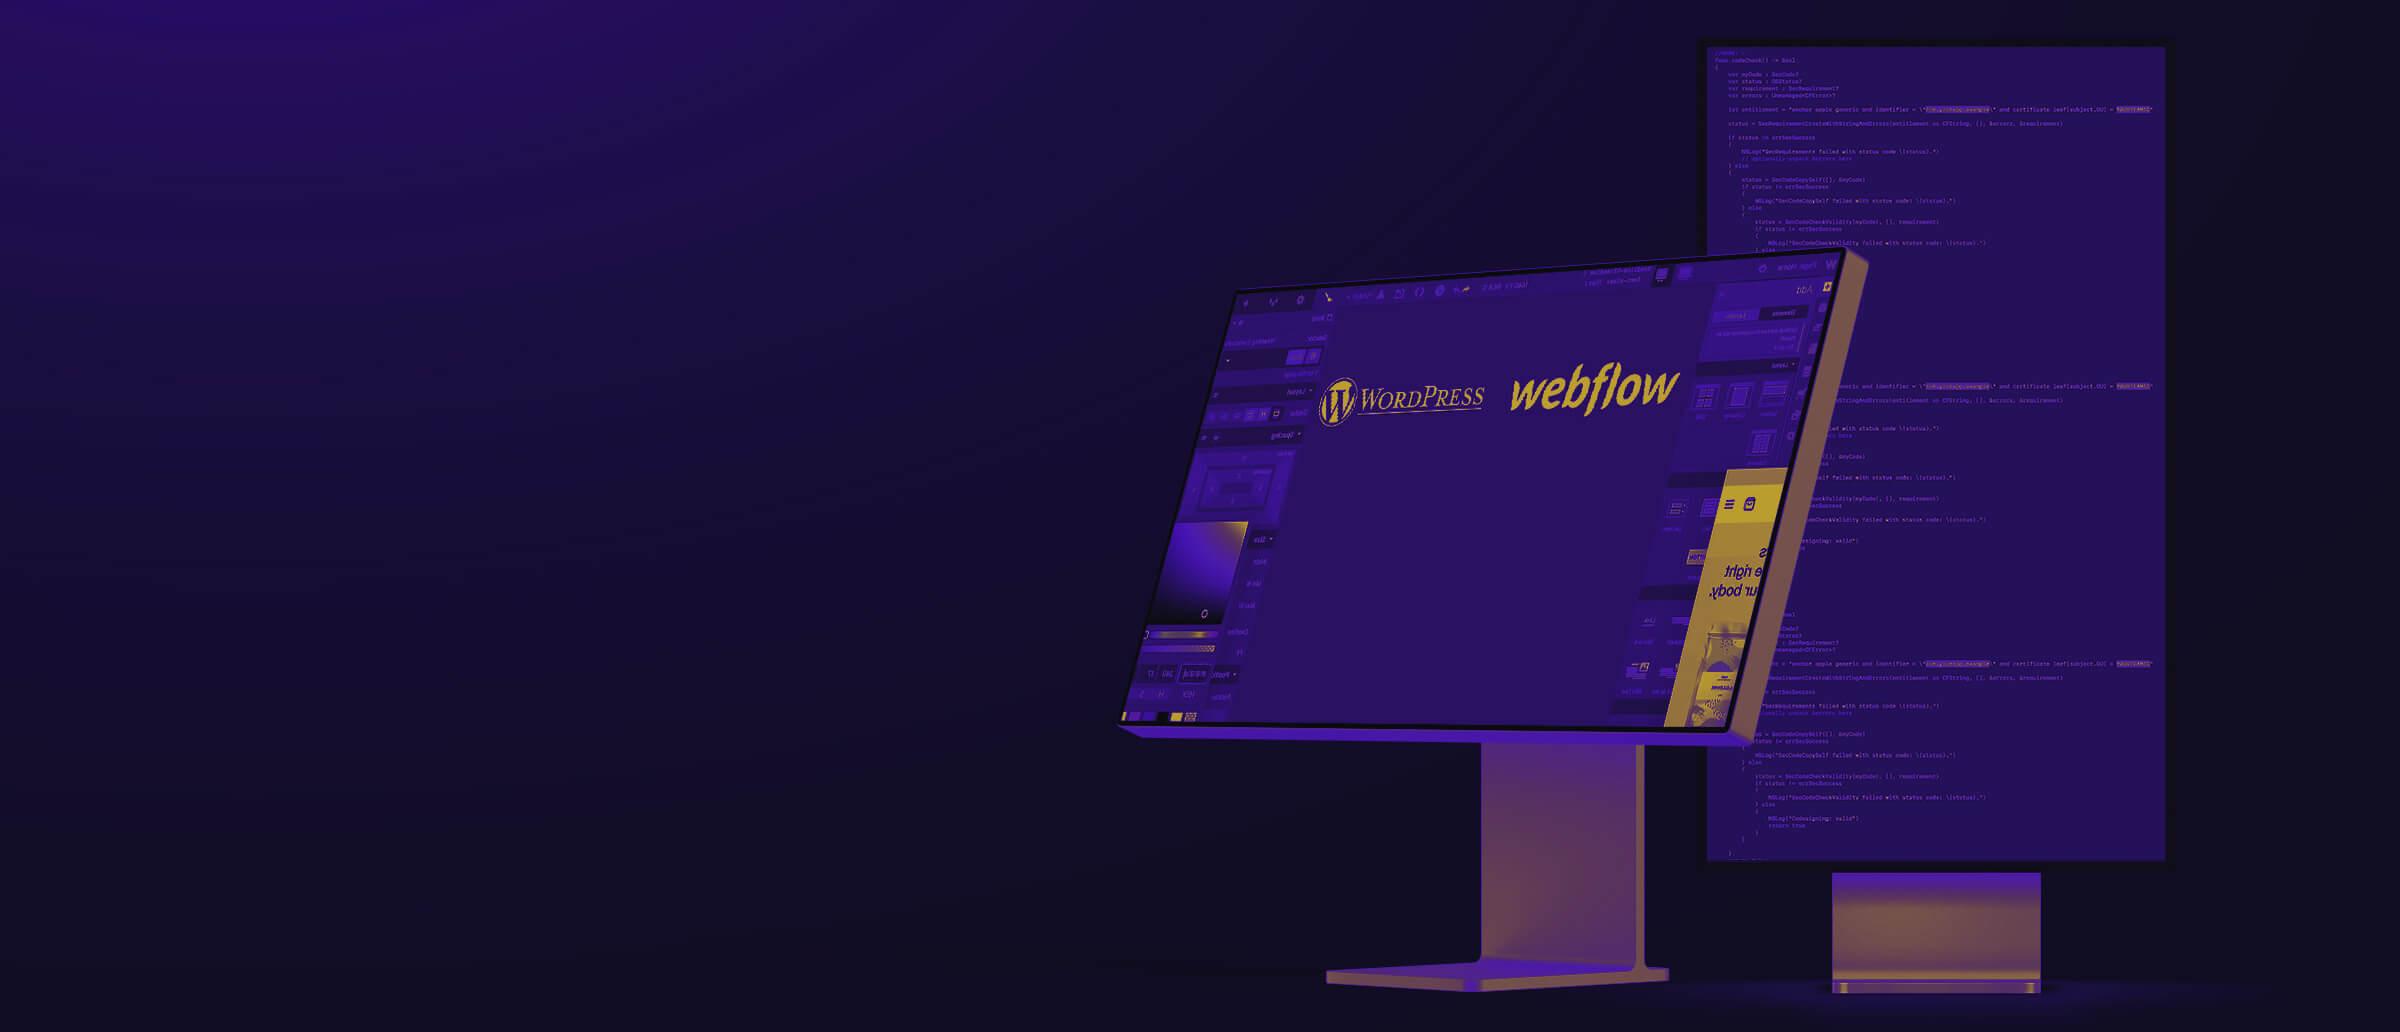 Sideview of Desktop Screen